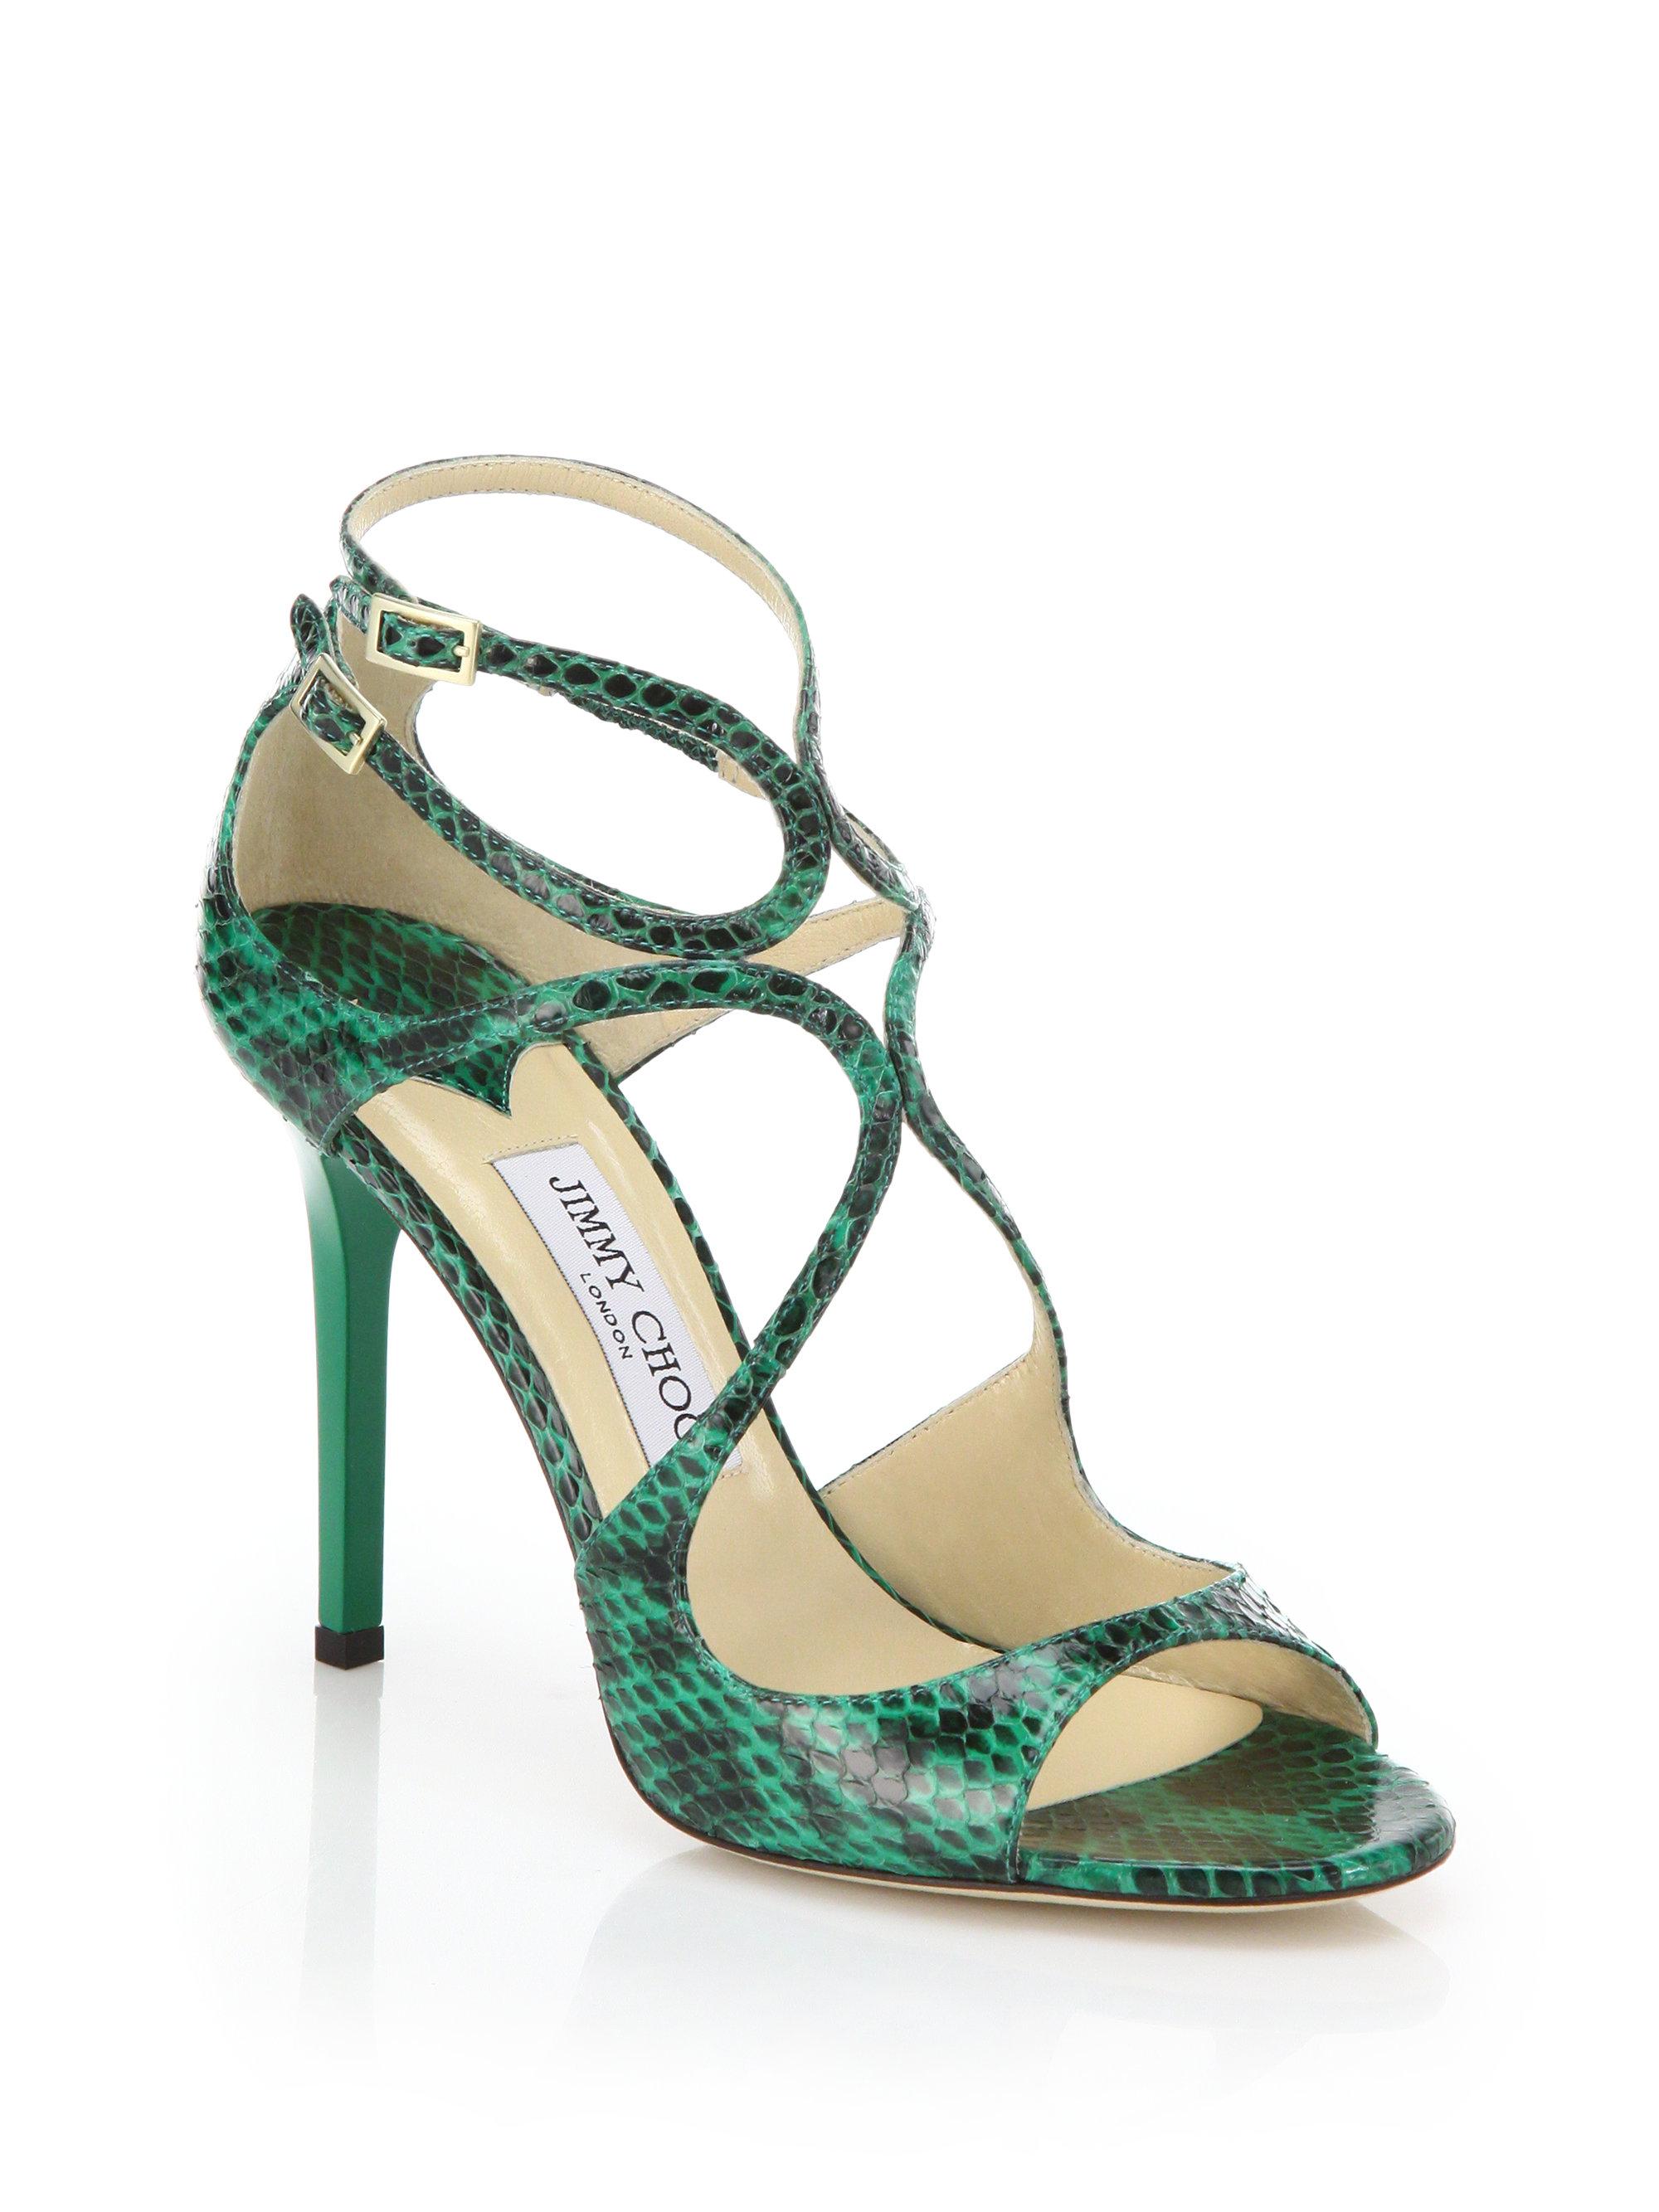 7e07667693 Jimmy Choo Lang Snakeskin Sandals in Green - Lyst